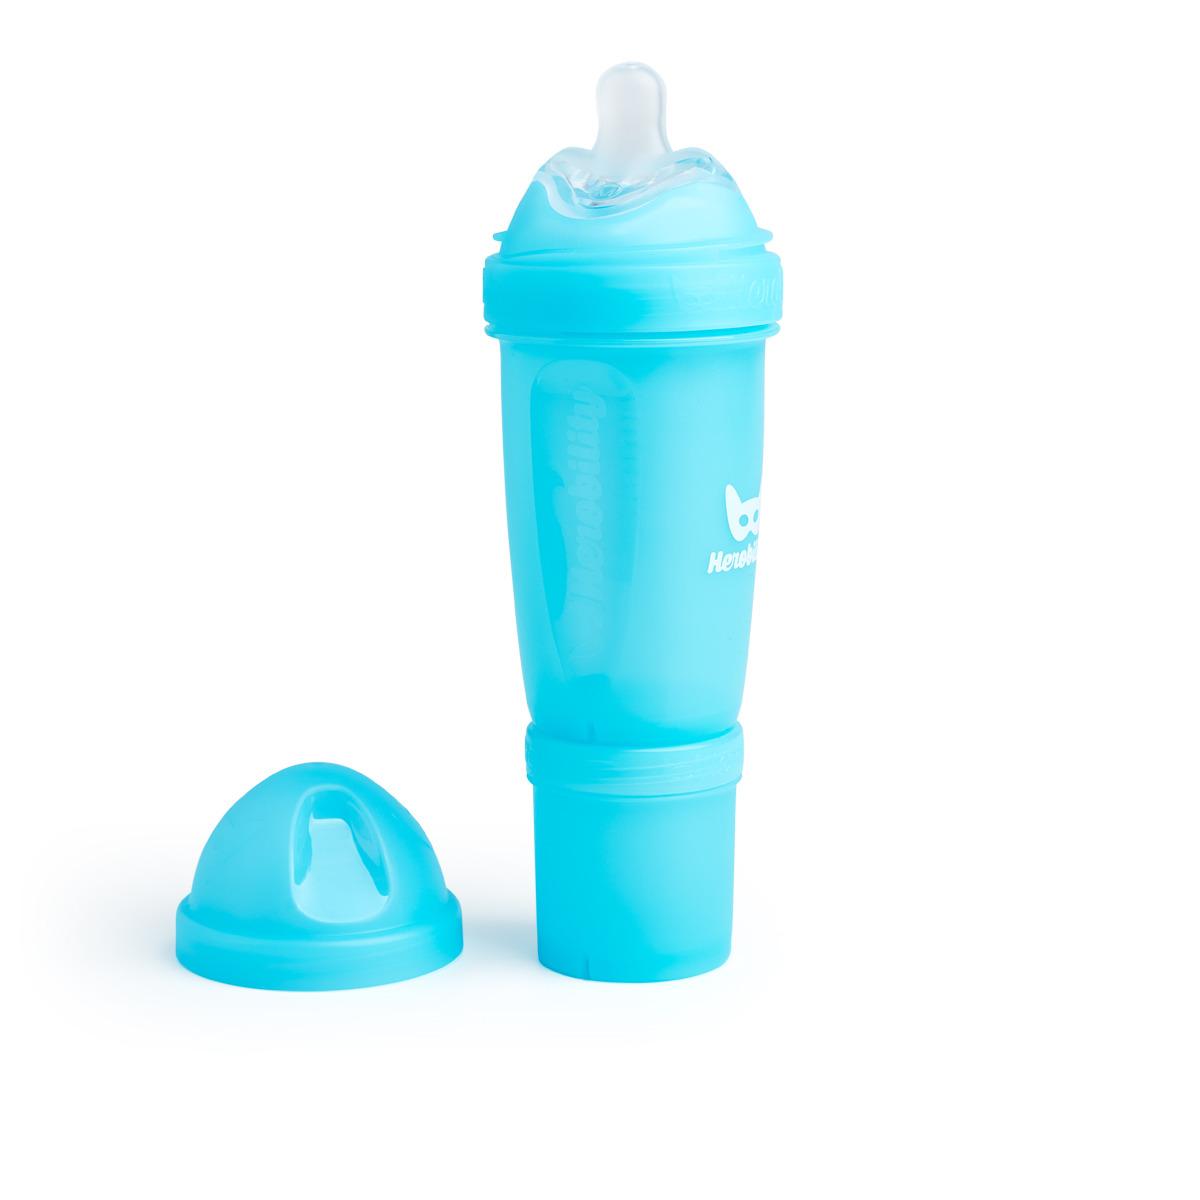 Herobility - butelka antykolkowa Herobottle 240 ml, niebieska + smoczek M (2 m+)